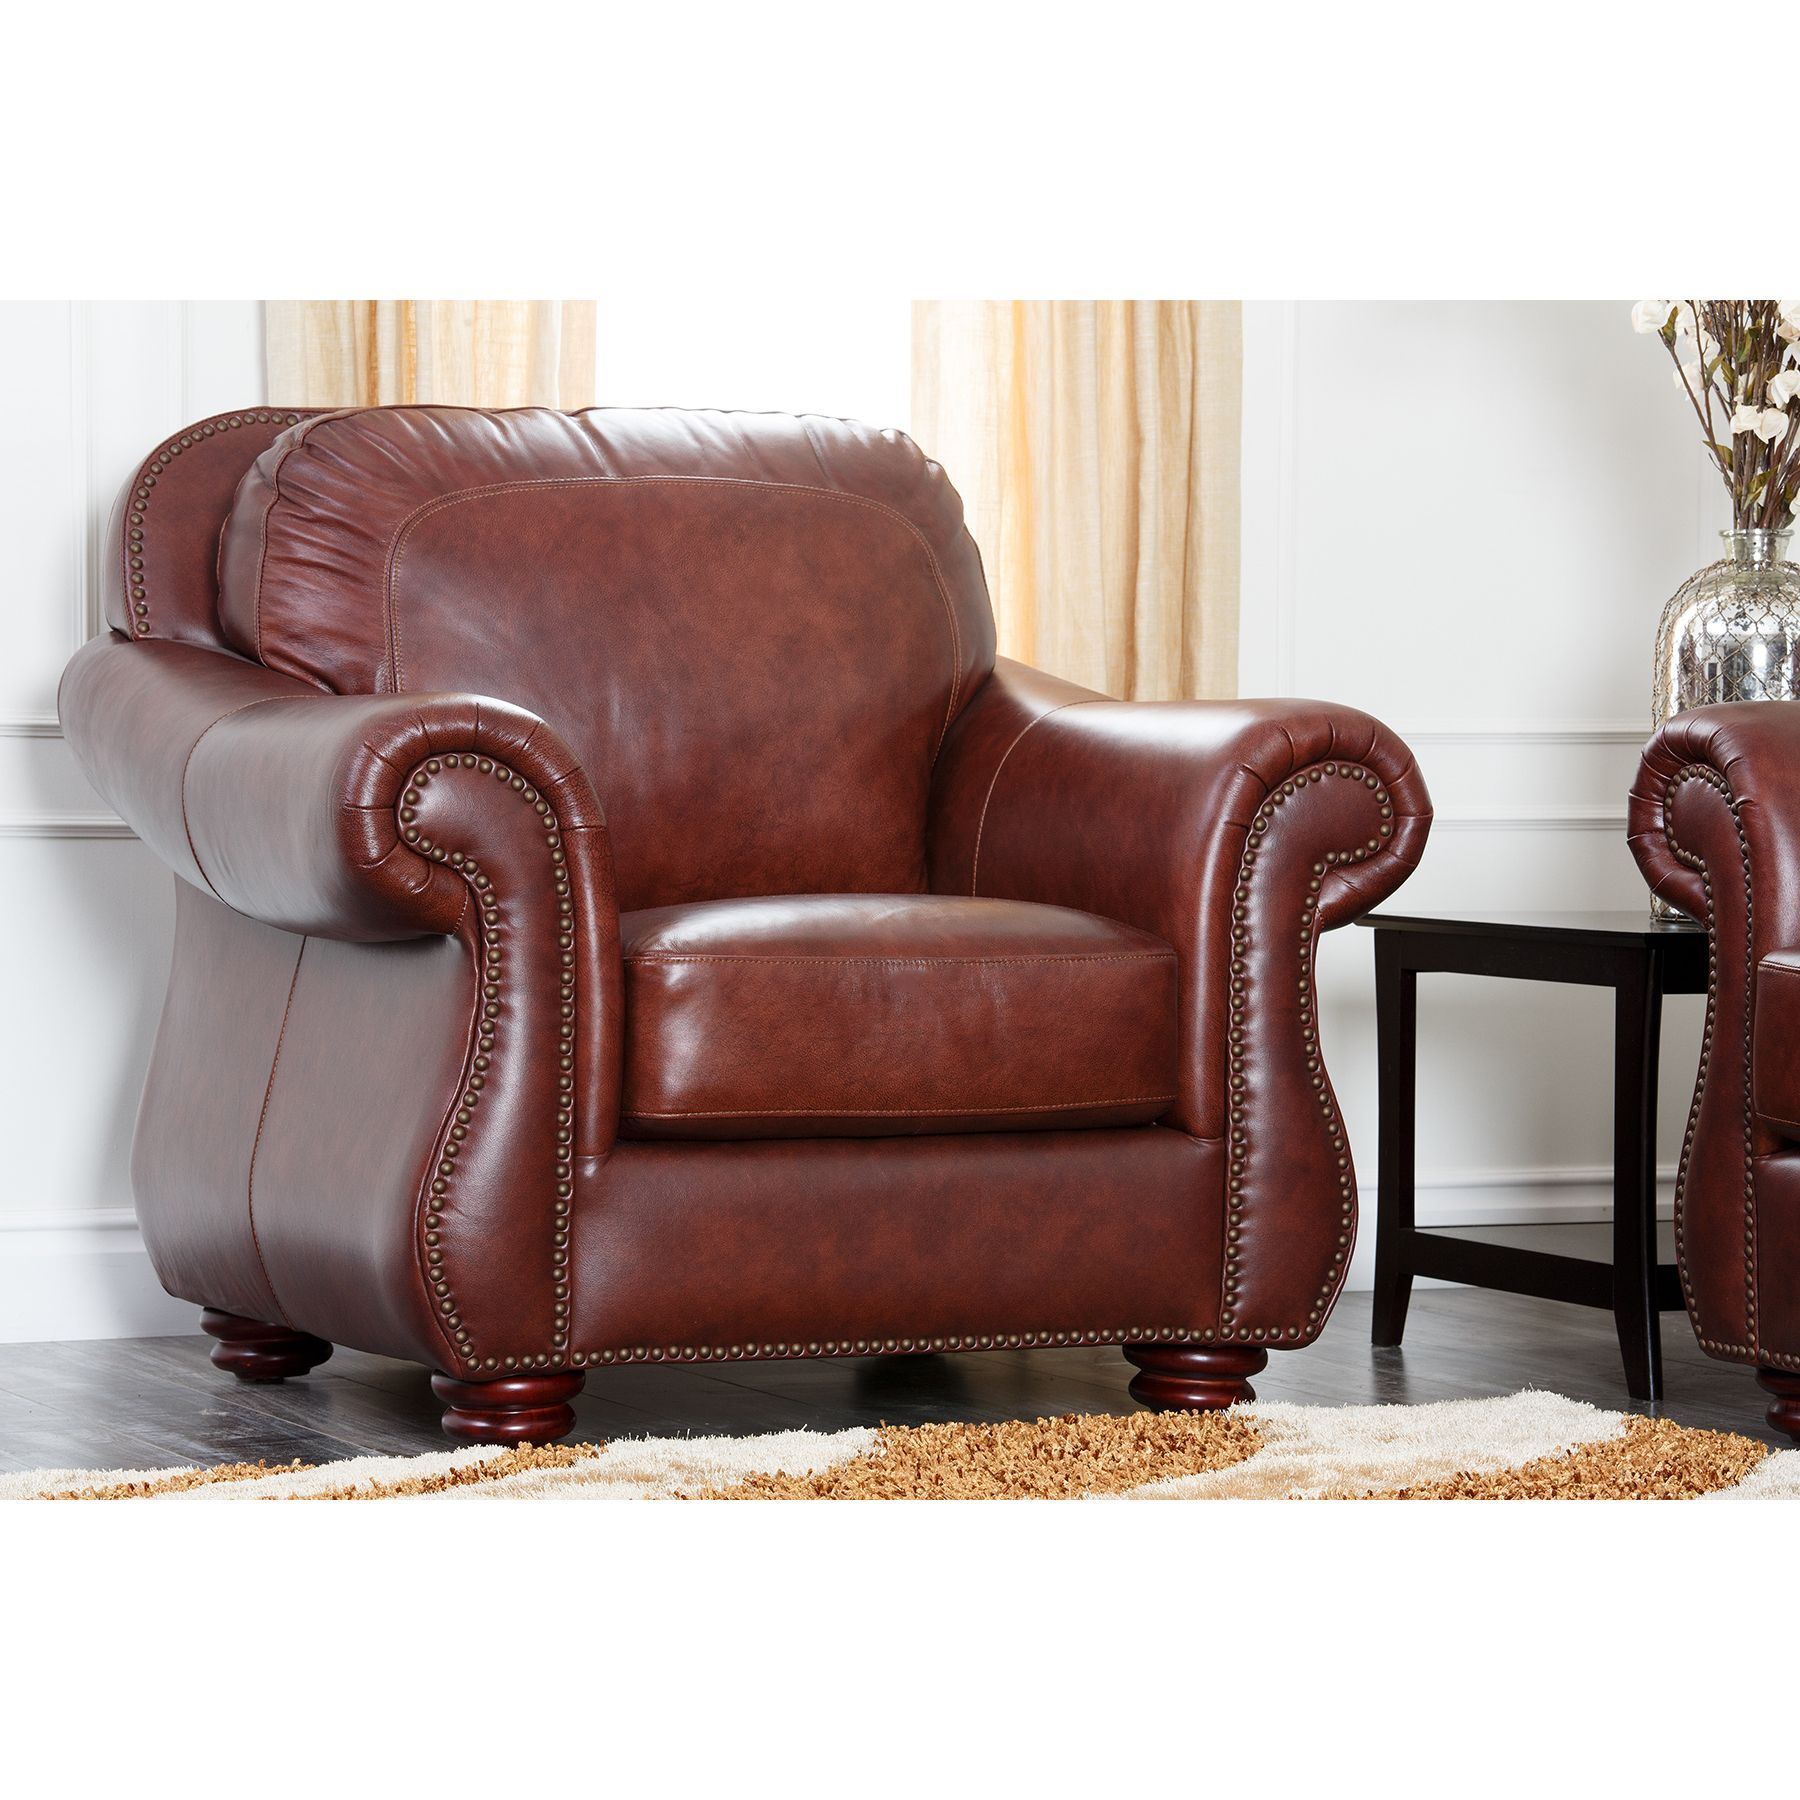 Abbyson Living Chandler Leather Armchair